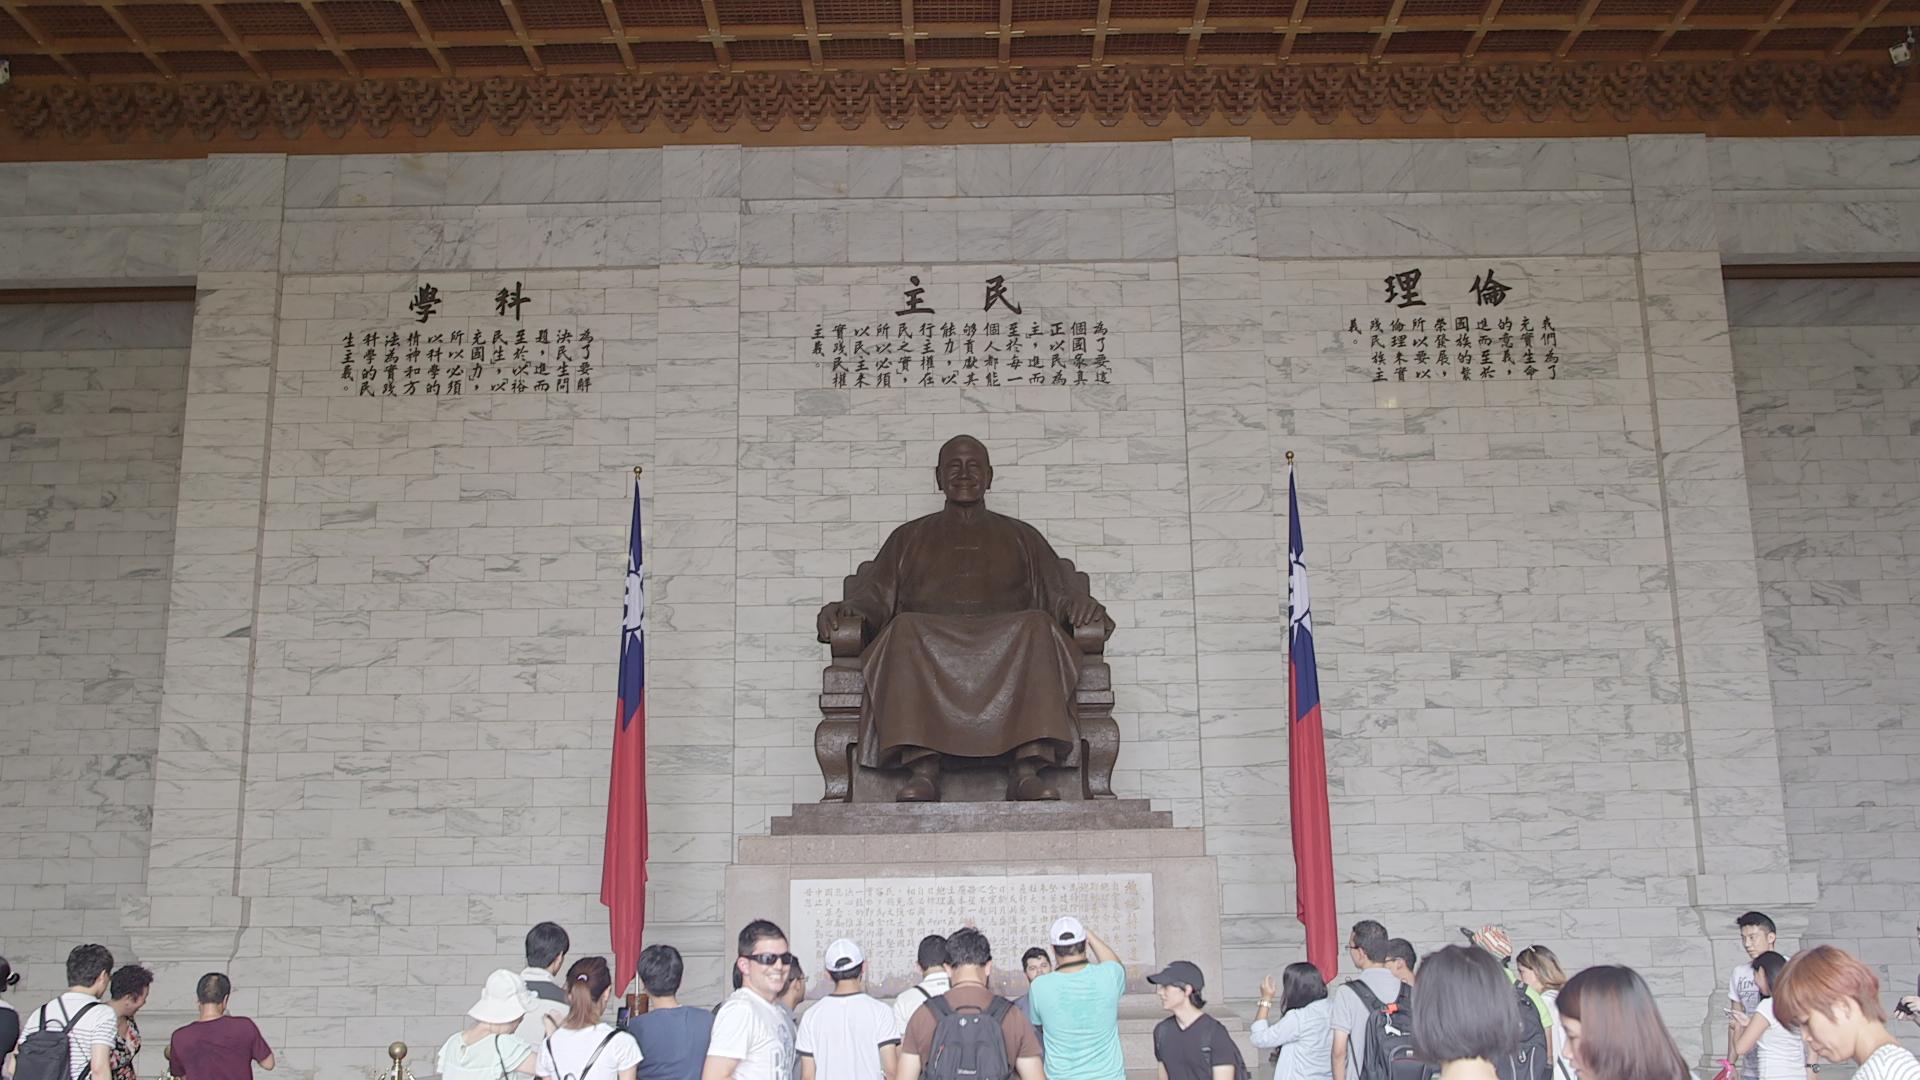 Chaing Kai Shek Memorial (looks like the Abe Lincoln memorial).